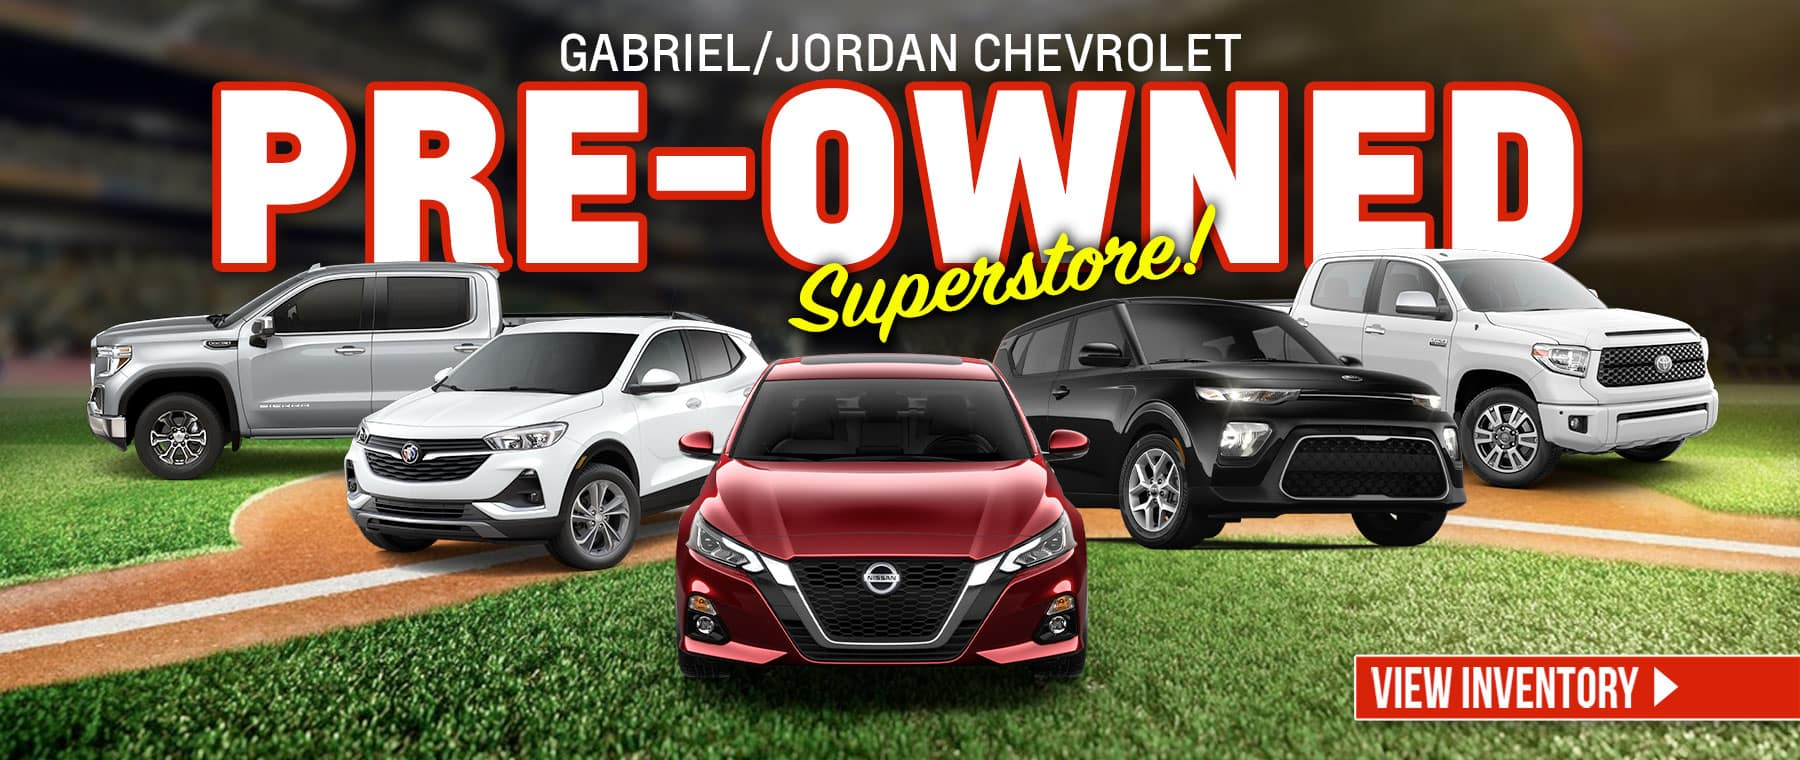 Gabriel Jordan Chevrolet - Pre-Owned Superstore